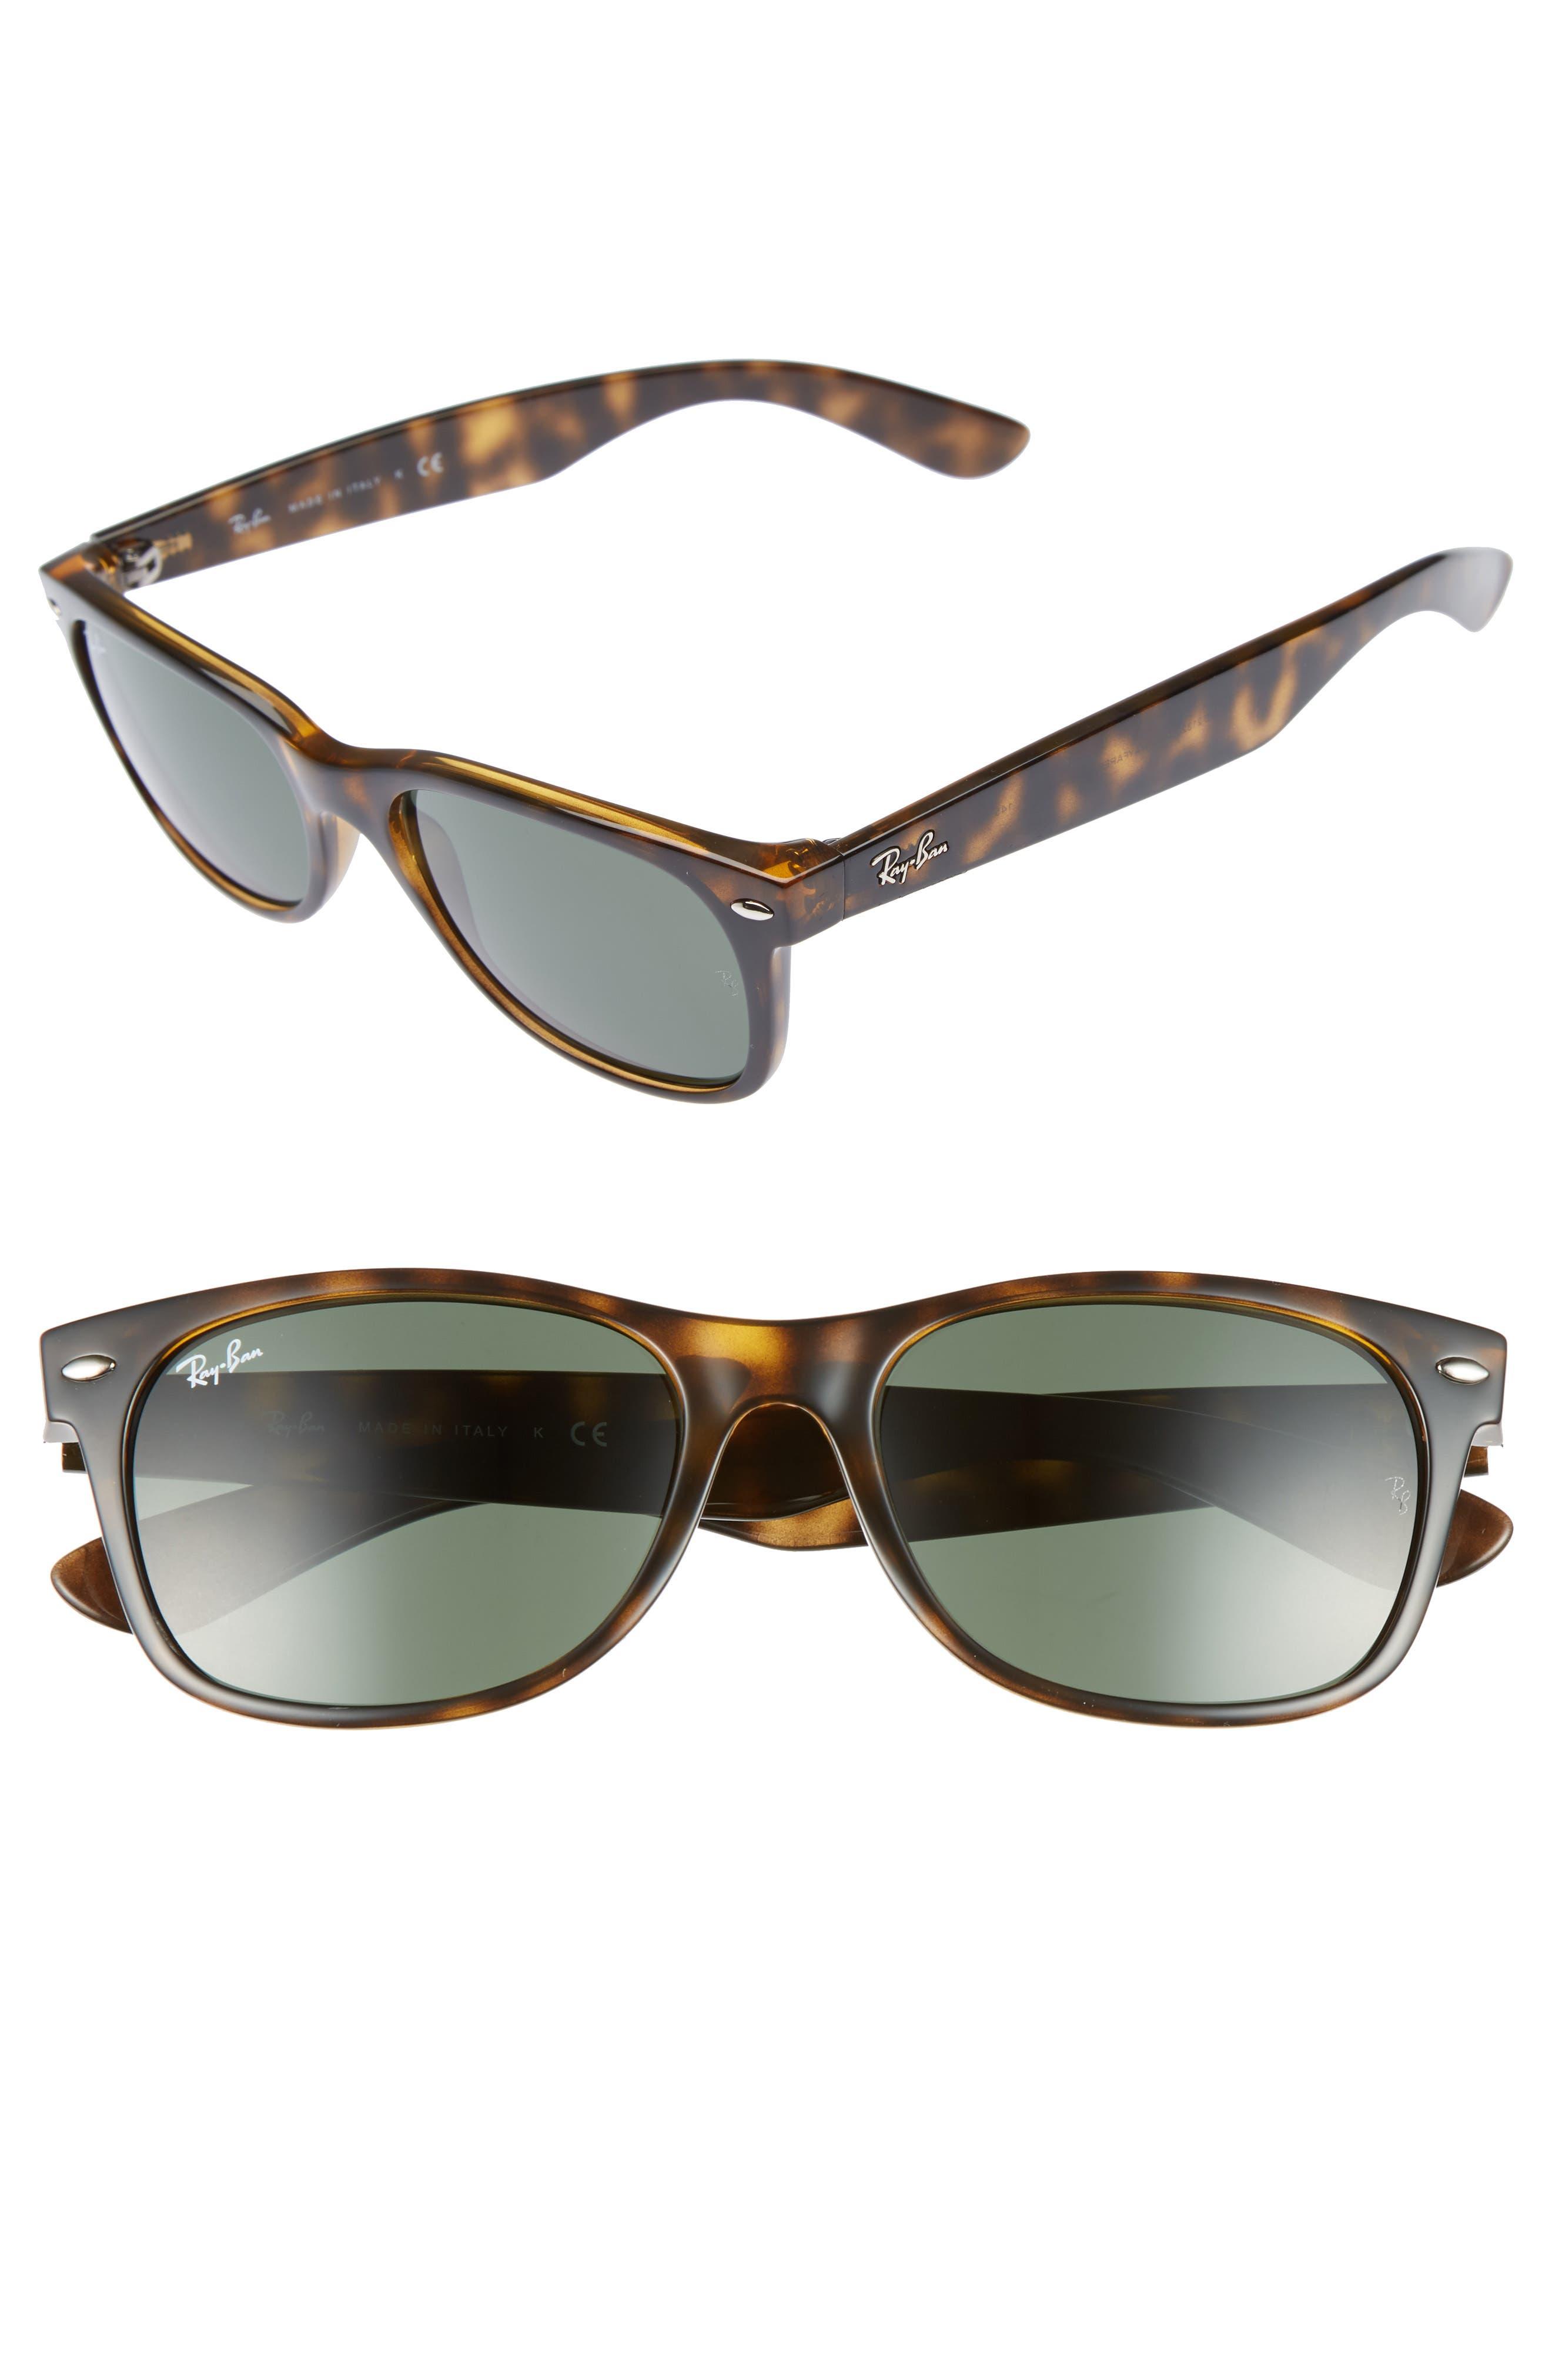 Ray-Ban Standard New Wayfarer 55Mm Sunglasses - Dark Tortoise